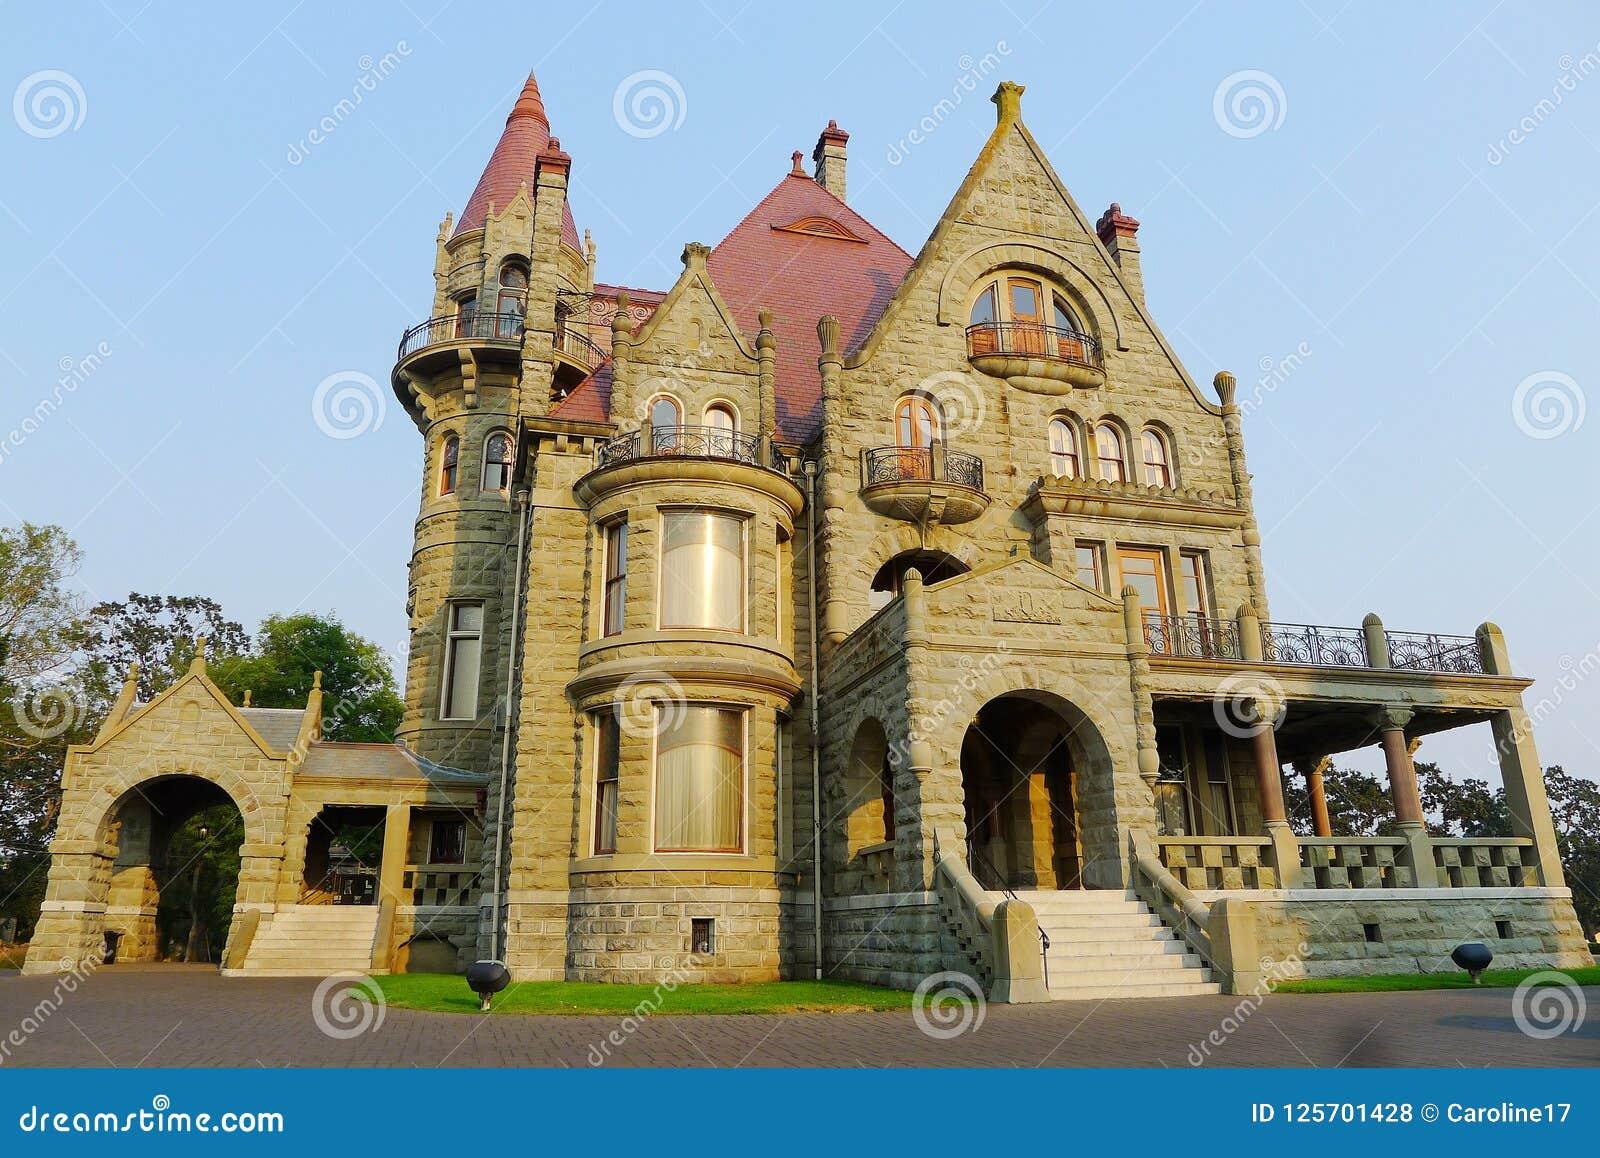 Craigdarroch Castle Victoria British Columbia Stock Photo Image Of Architecture Mansion